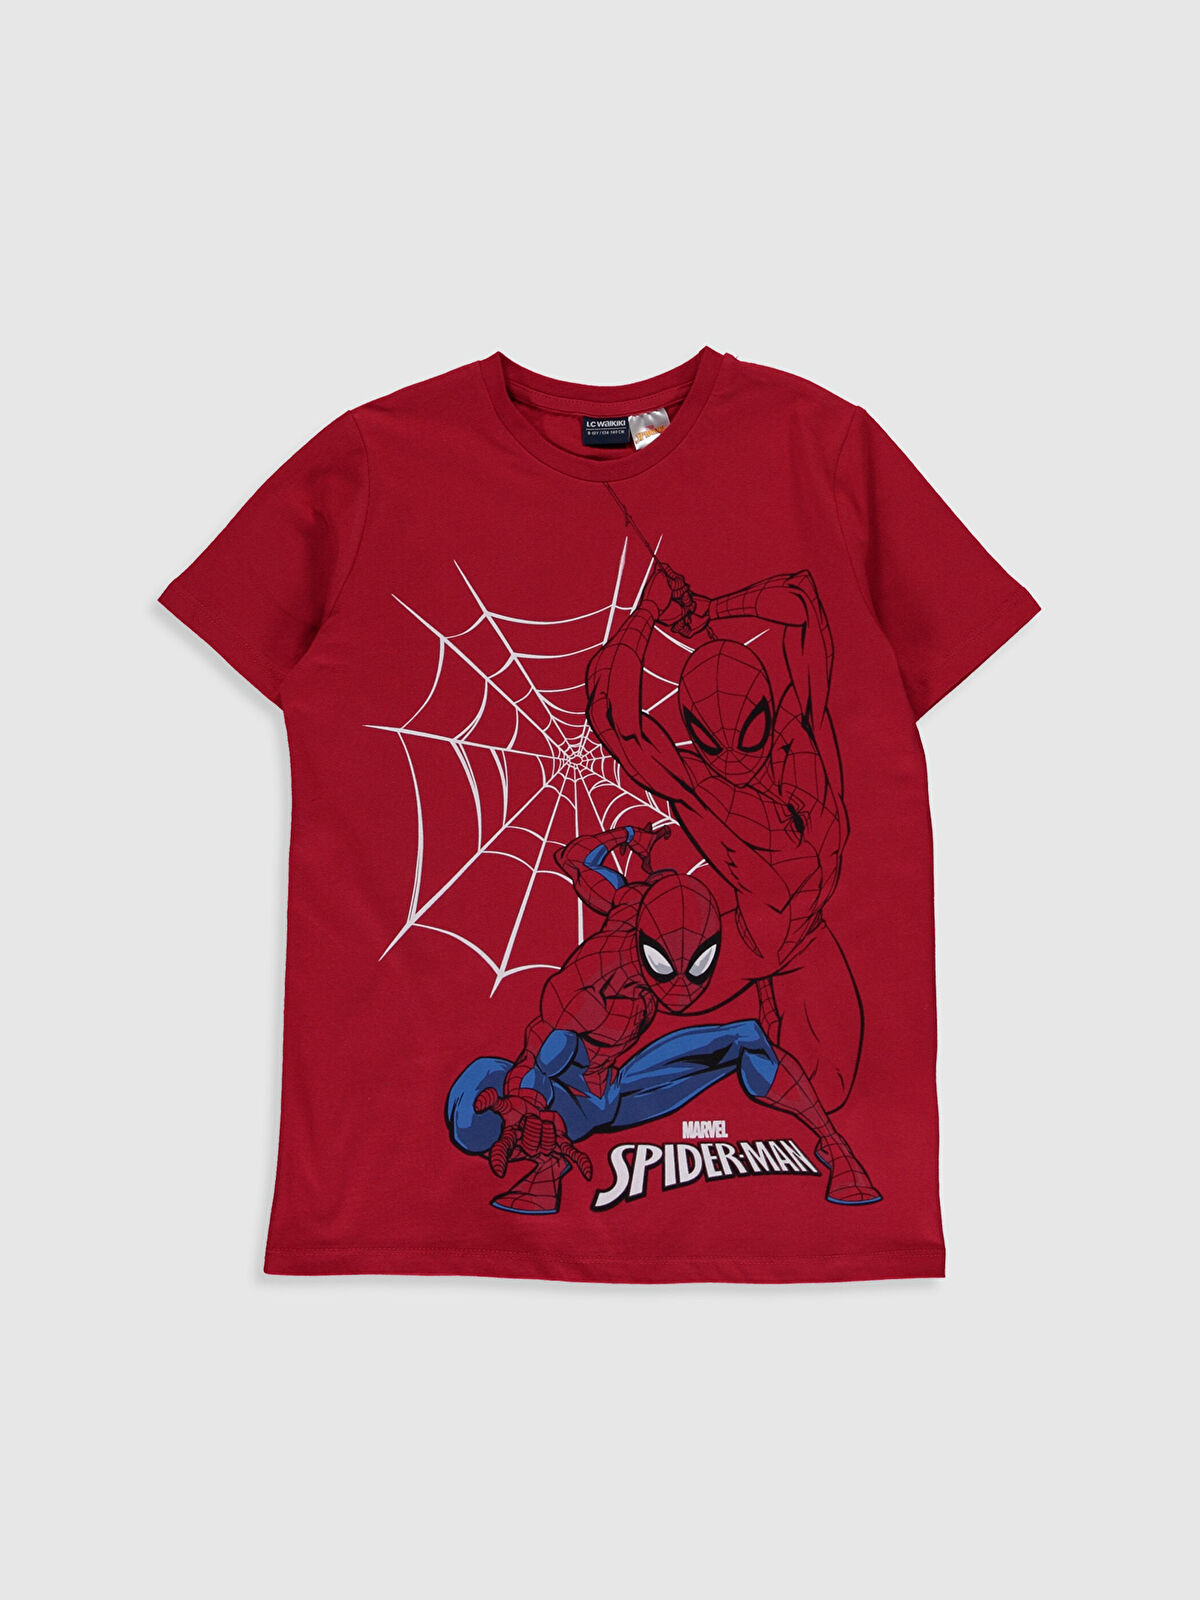 Erkek Çocuk Spiderman Pamuklu Tişört - LC WAIKIKI